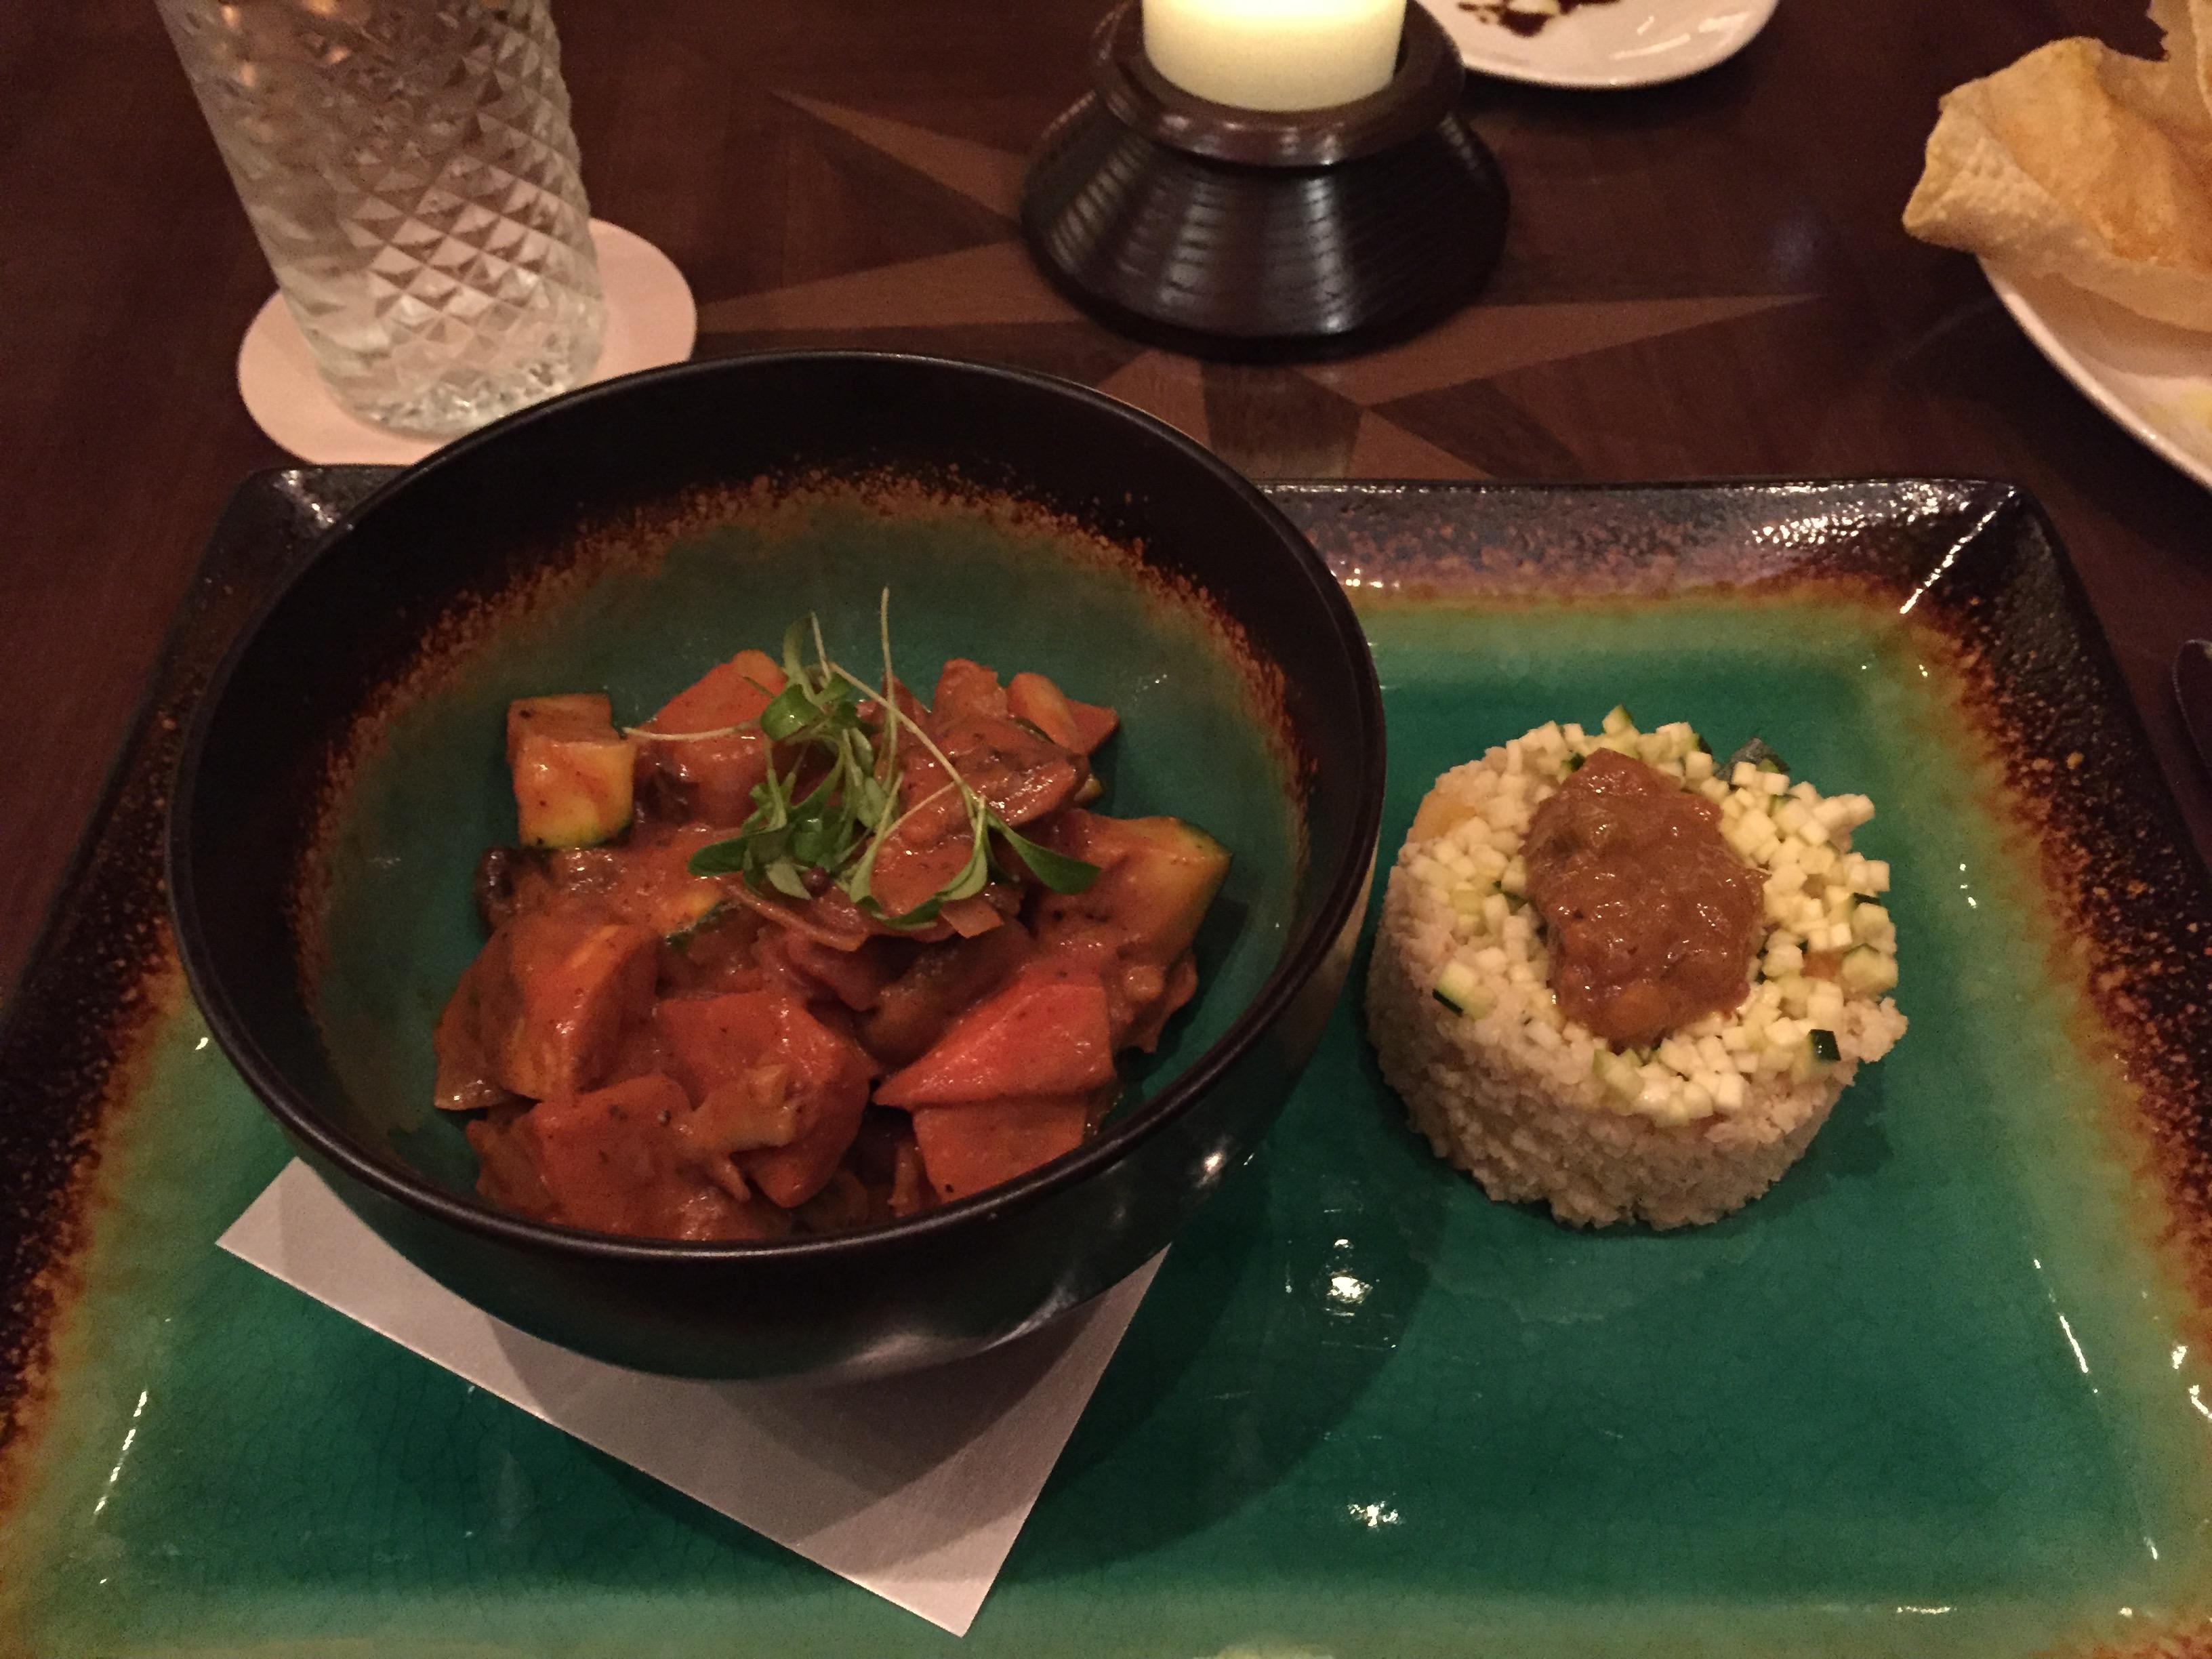 Vegan dining options at Tiffins at Disney's Animal Kingdom